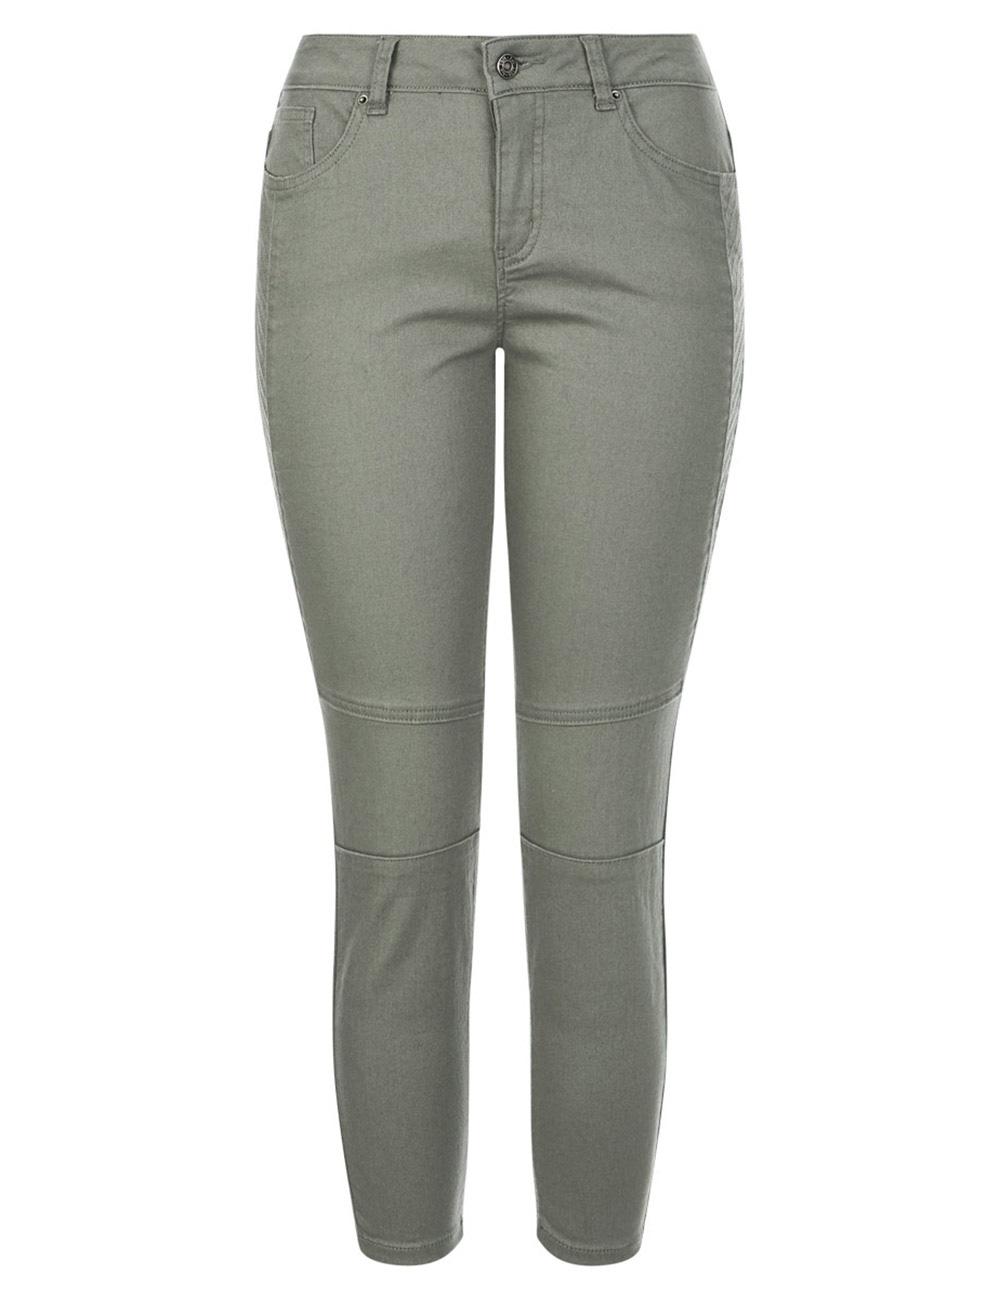 Katies Mid Rise Seamed Detail Ankle Grazer Denim Jeans - Garment Dye Washed K